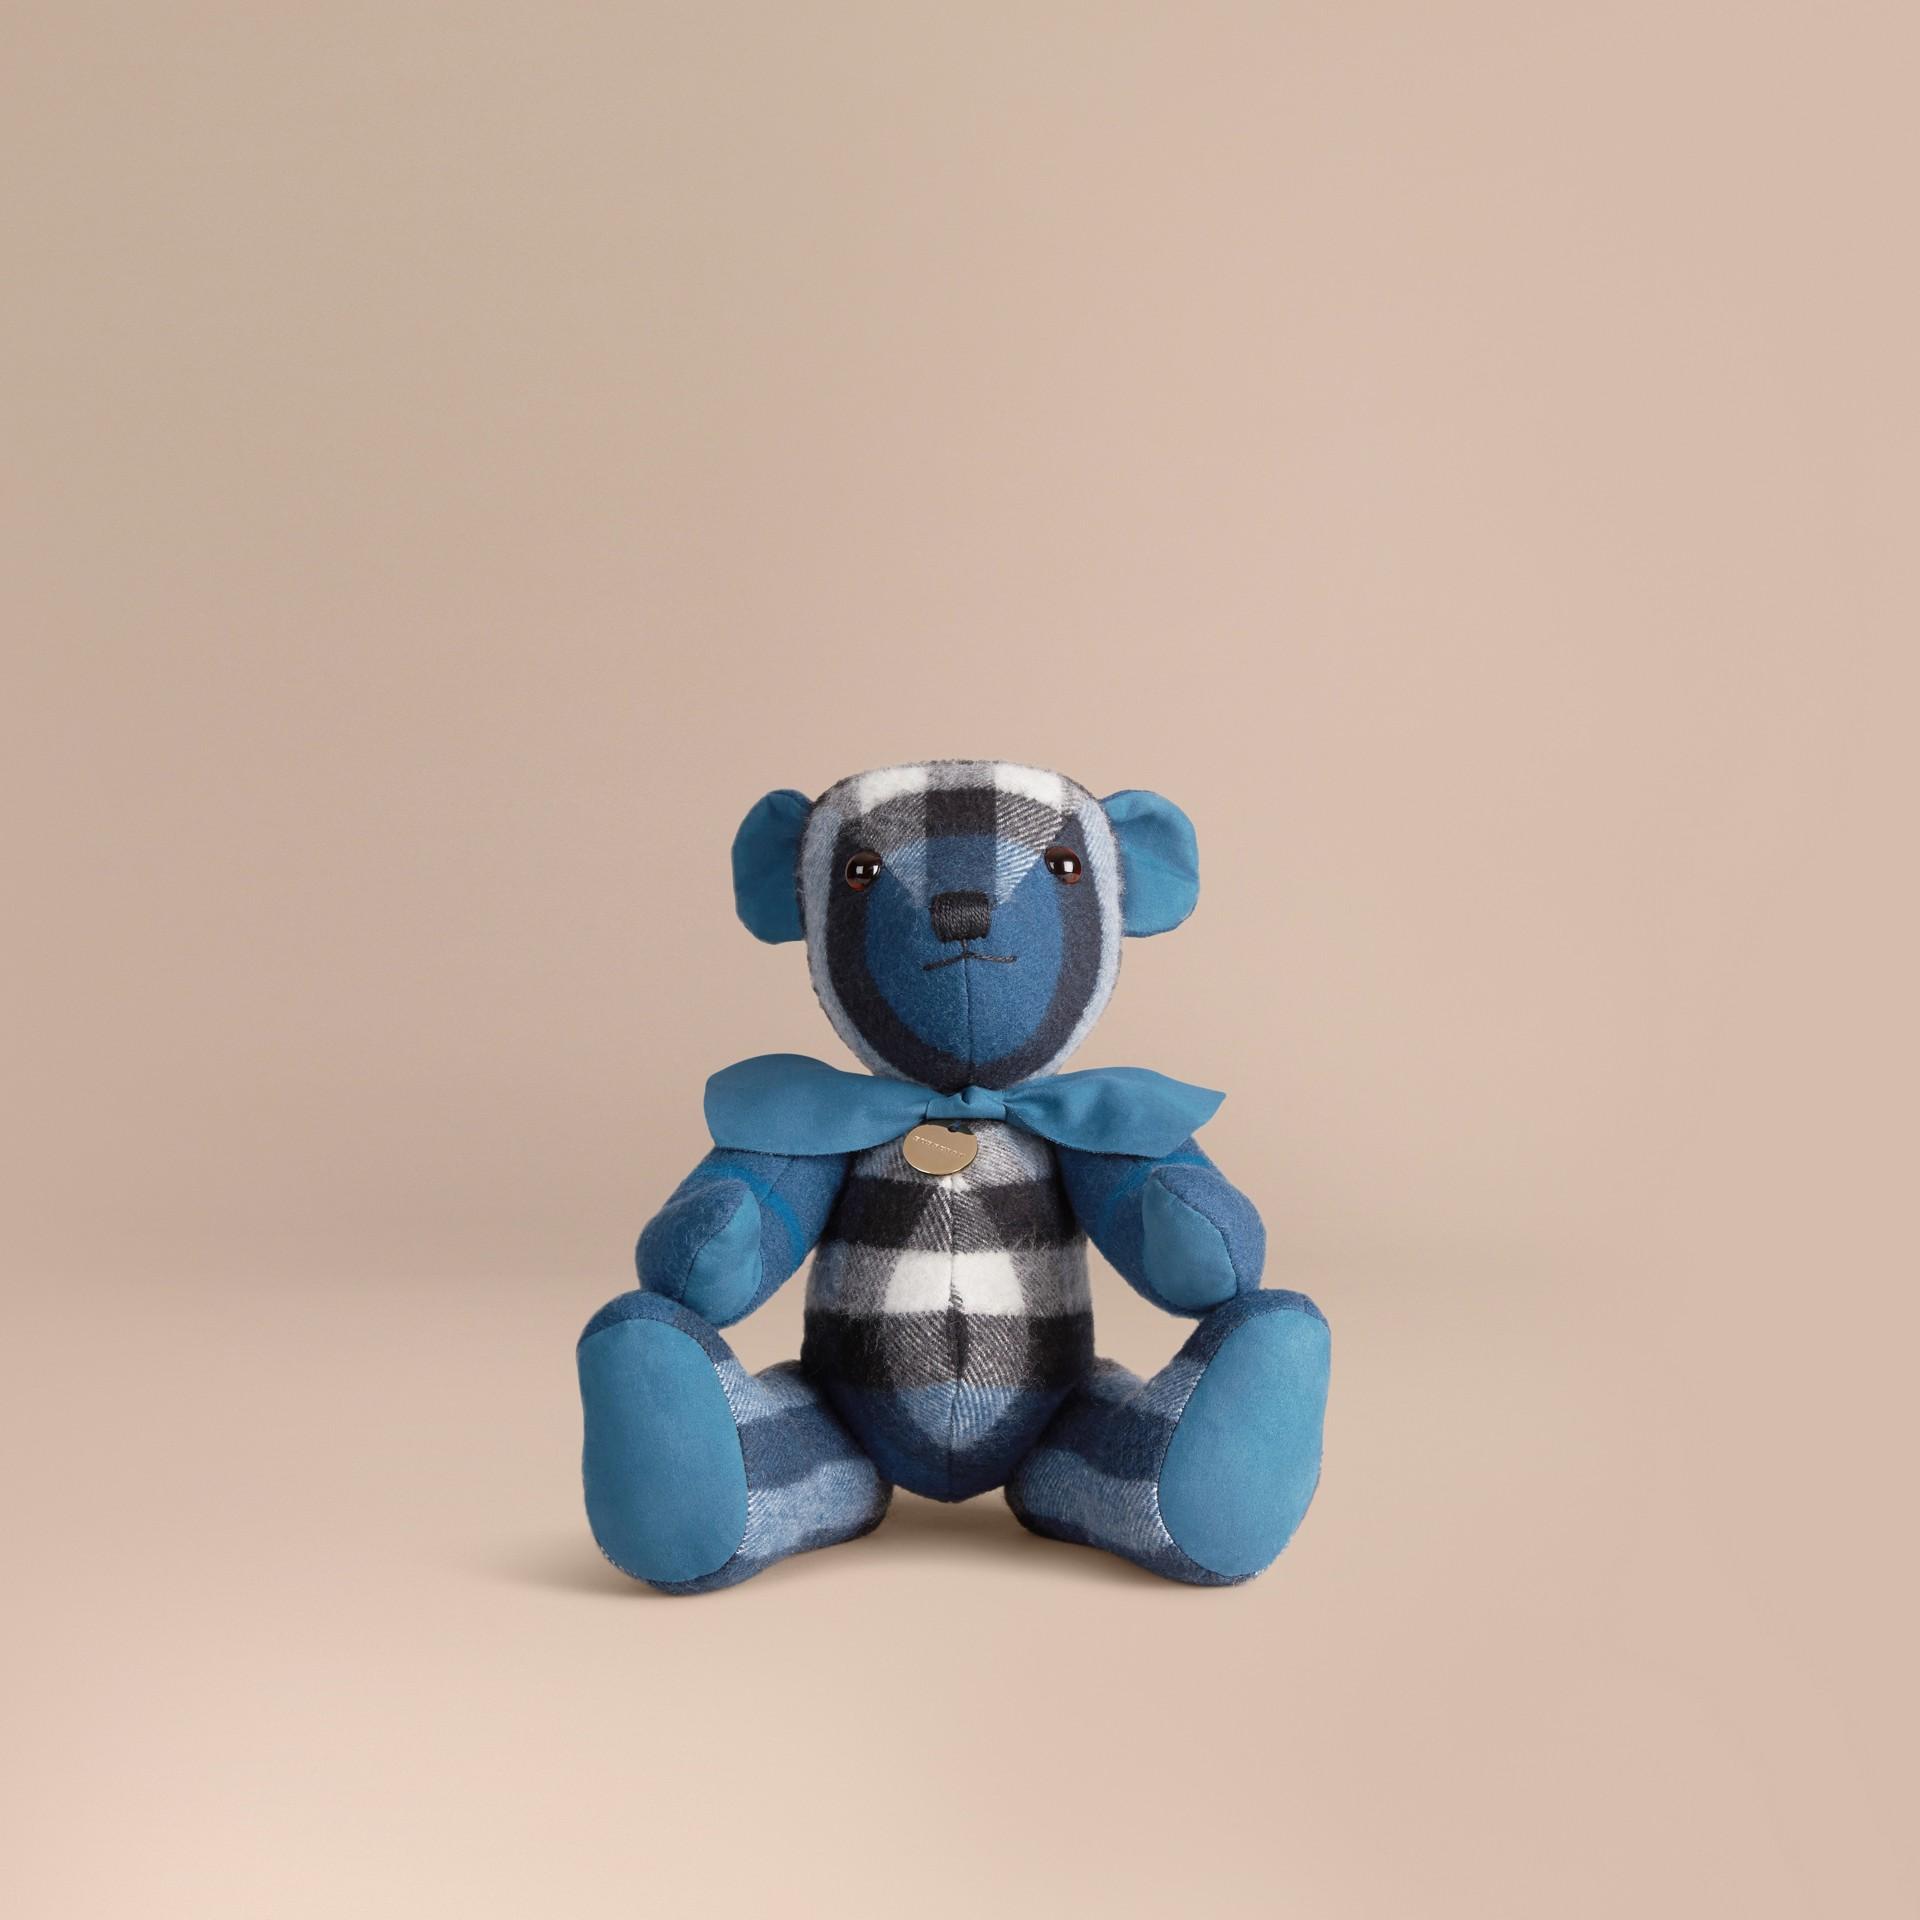 Ozeanblau Burberry-Teddybär aus Kaschmir mit Check-Muster Ozeanblau - Galerie-Bild 1